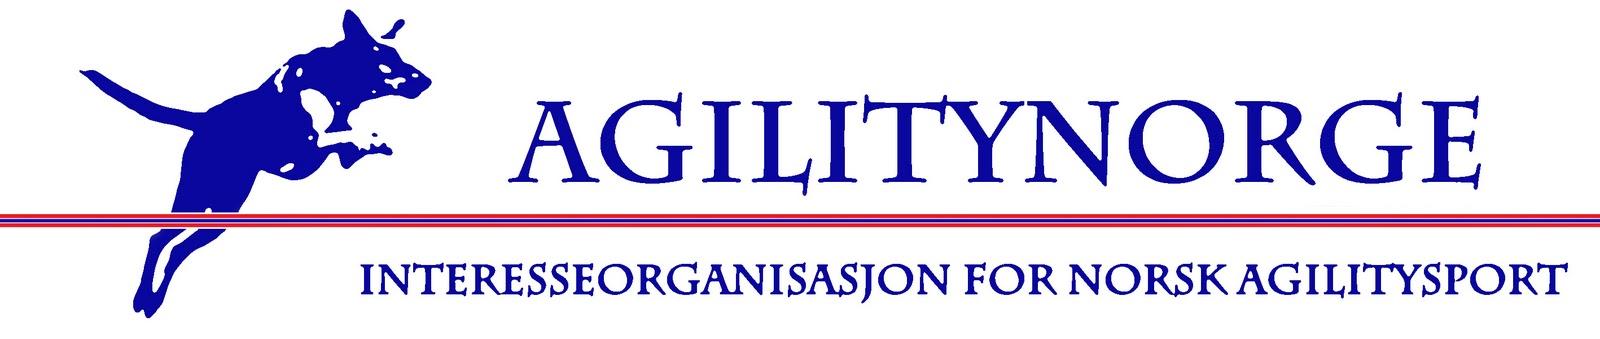 AgilityNorge